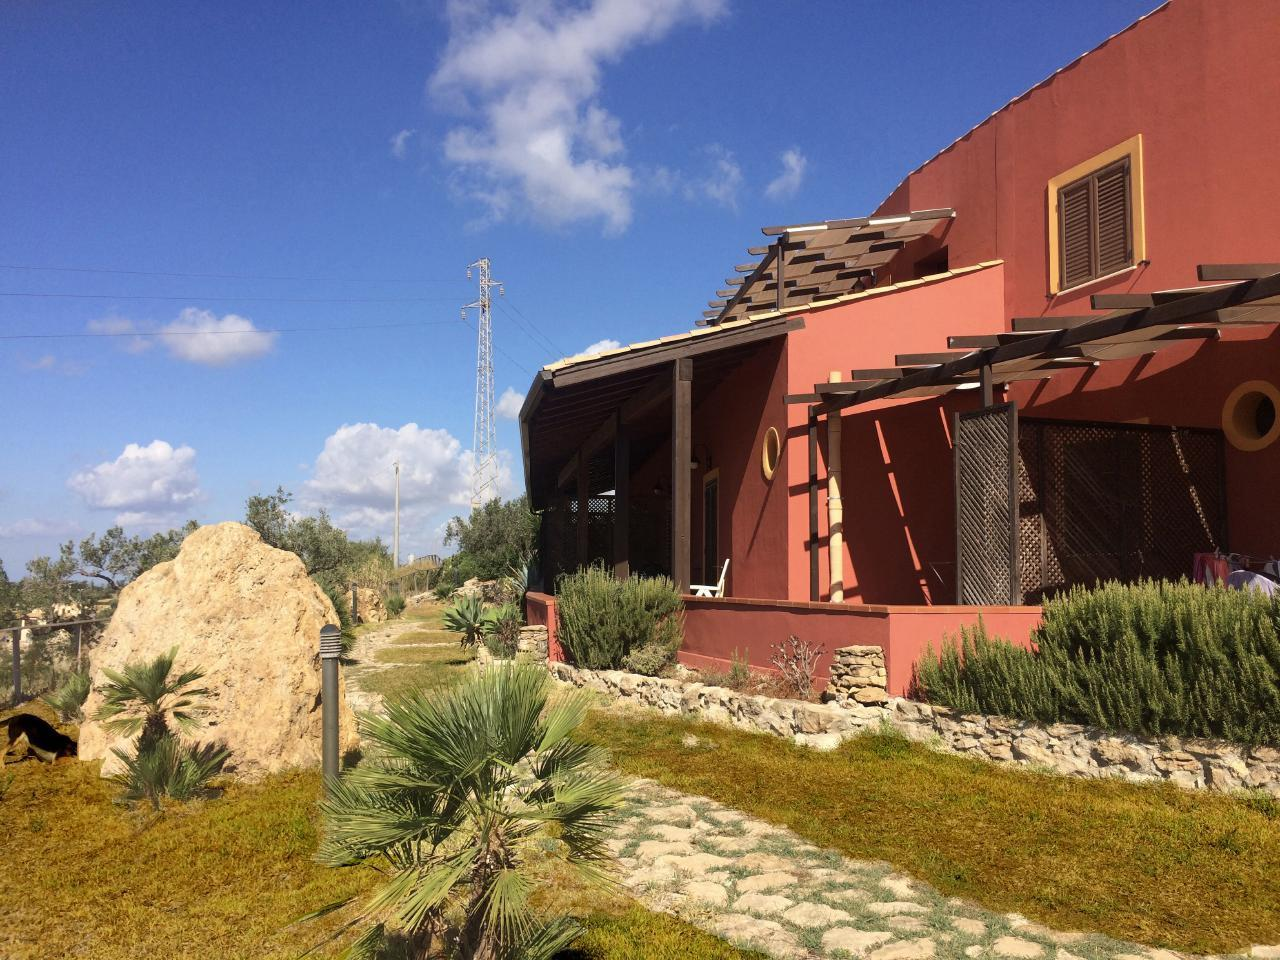 Appartement de vacances Ferienwohnungen (404150), Sciacca, Agrigento, Sicile, Italie, image 9